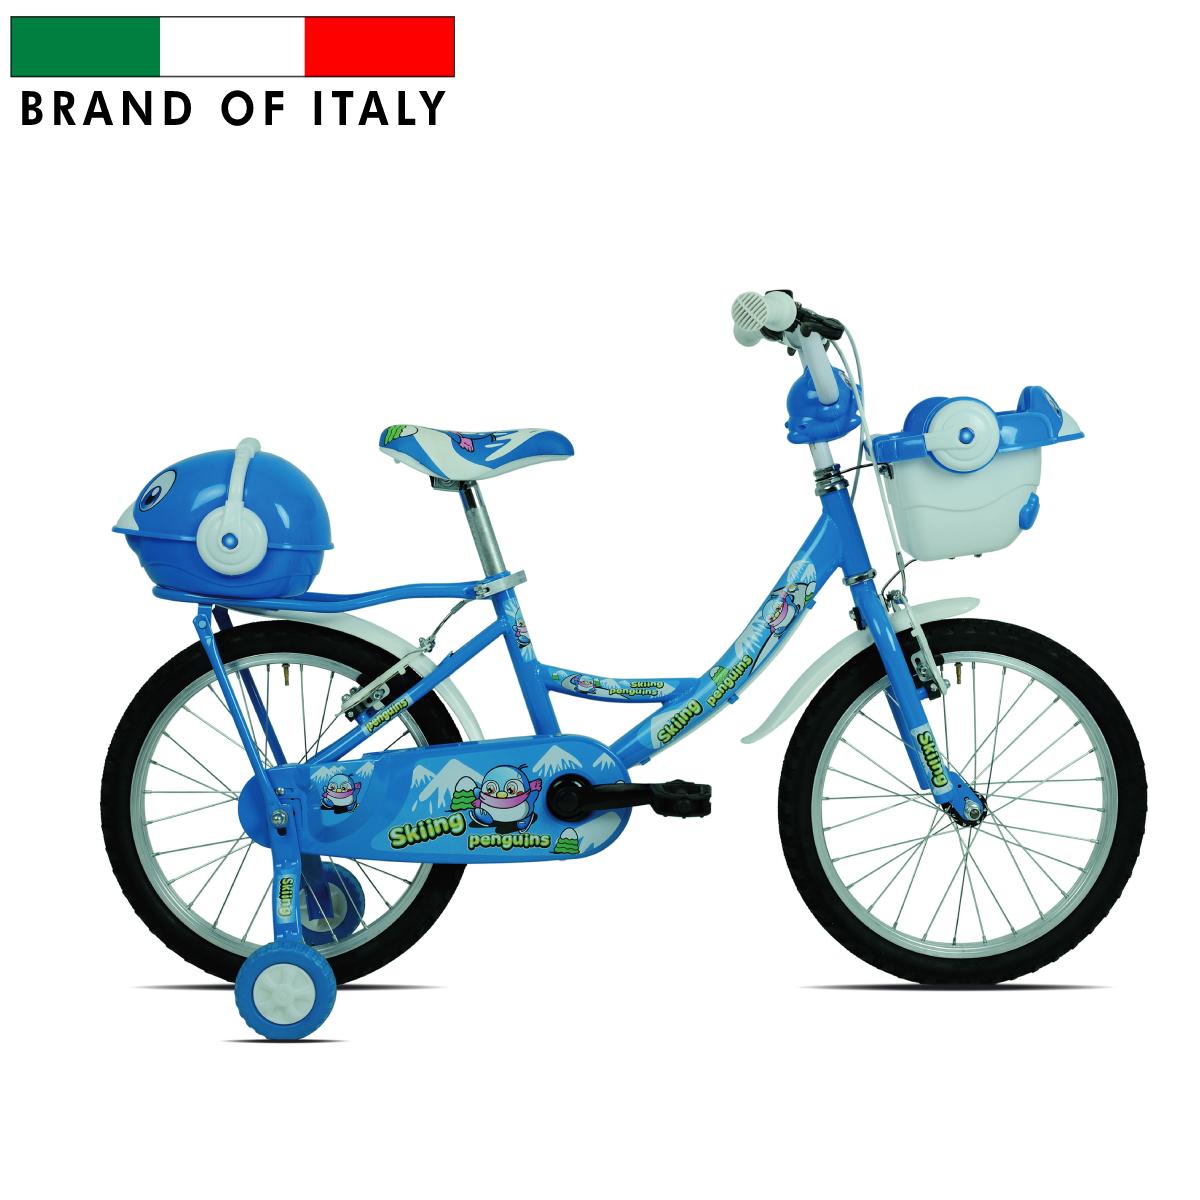 ESPERIA 9600 MTB 18 SKIING CELESTE BLUE 9600D1 Pilsētas velosipēds